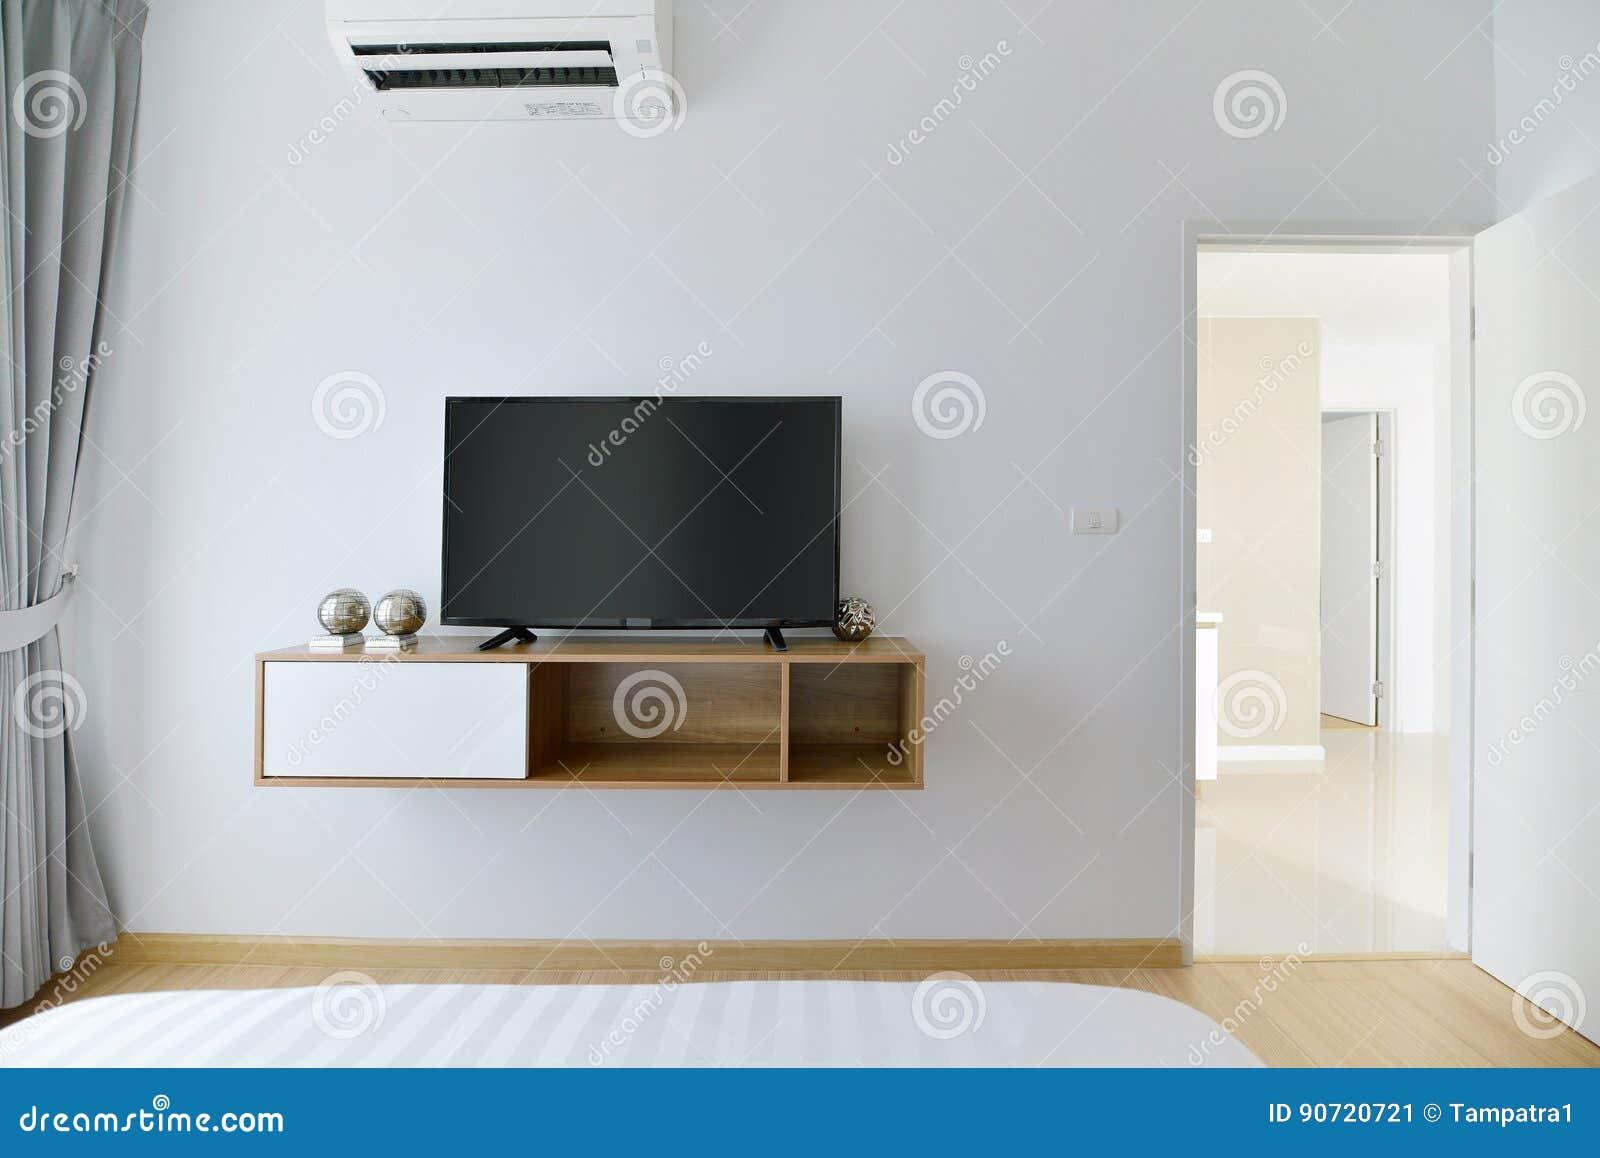 Moderne lege slaapkamer met geleide tv op witte muur en houten plank stock afbeelding - Muur plank onder tv ...